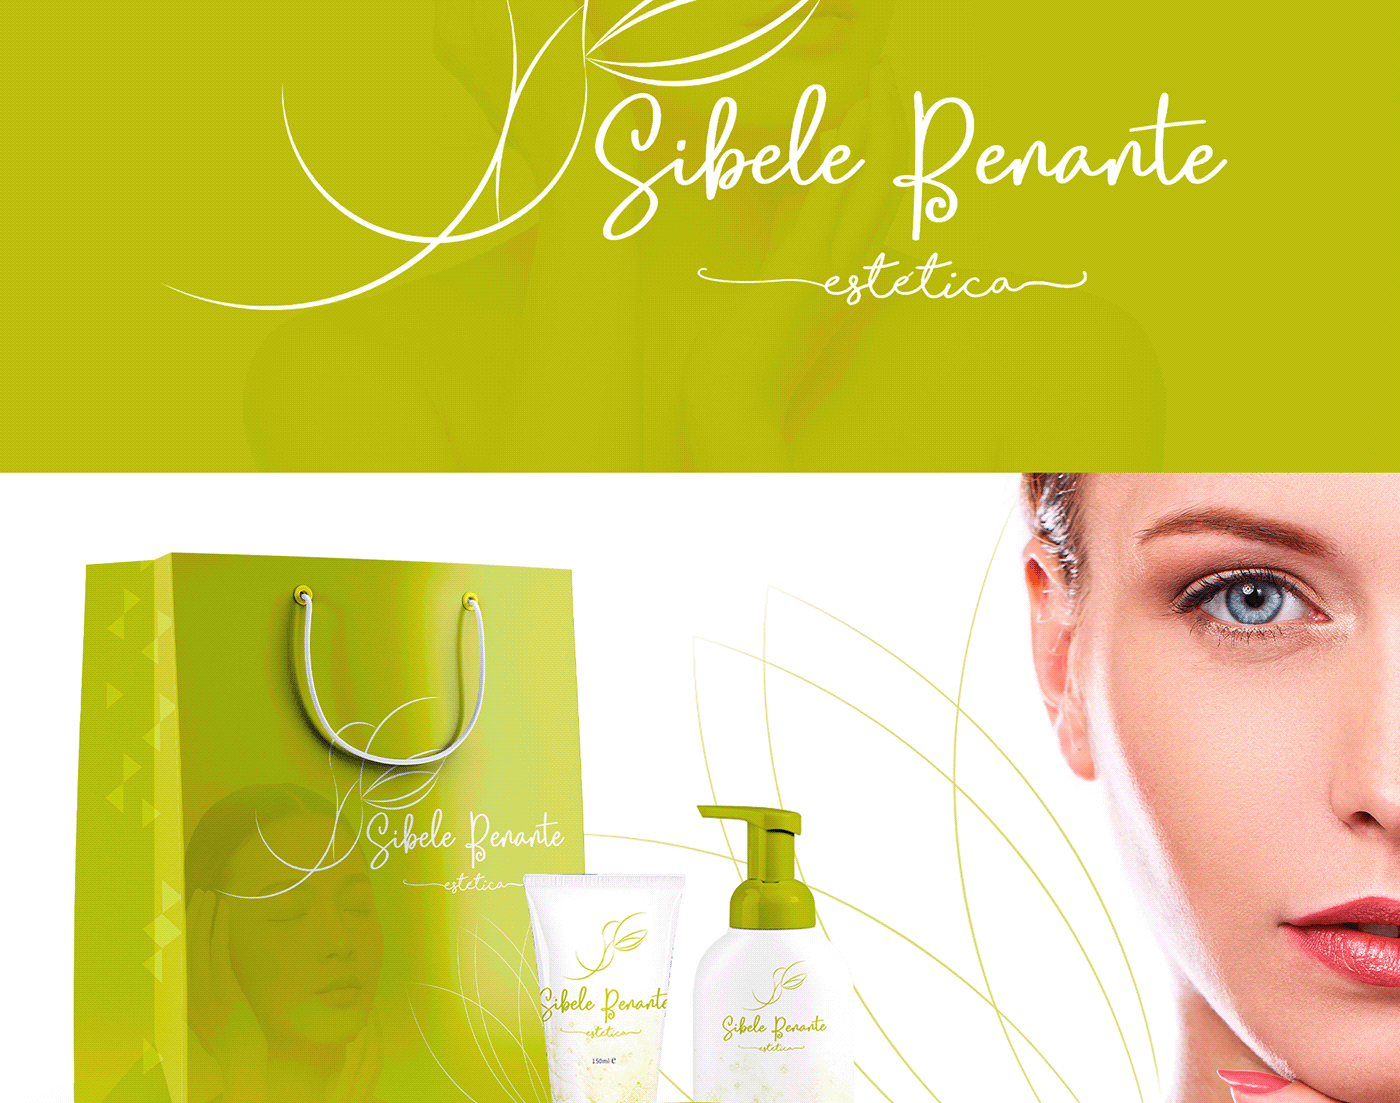 agência stork branding  estética estudio de beleza identidade visual logo Sibele Benante stork digital